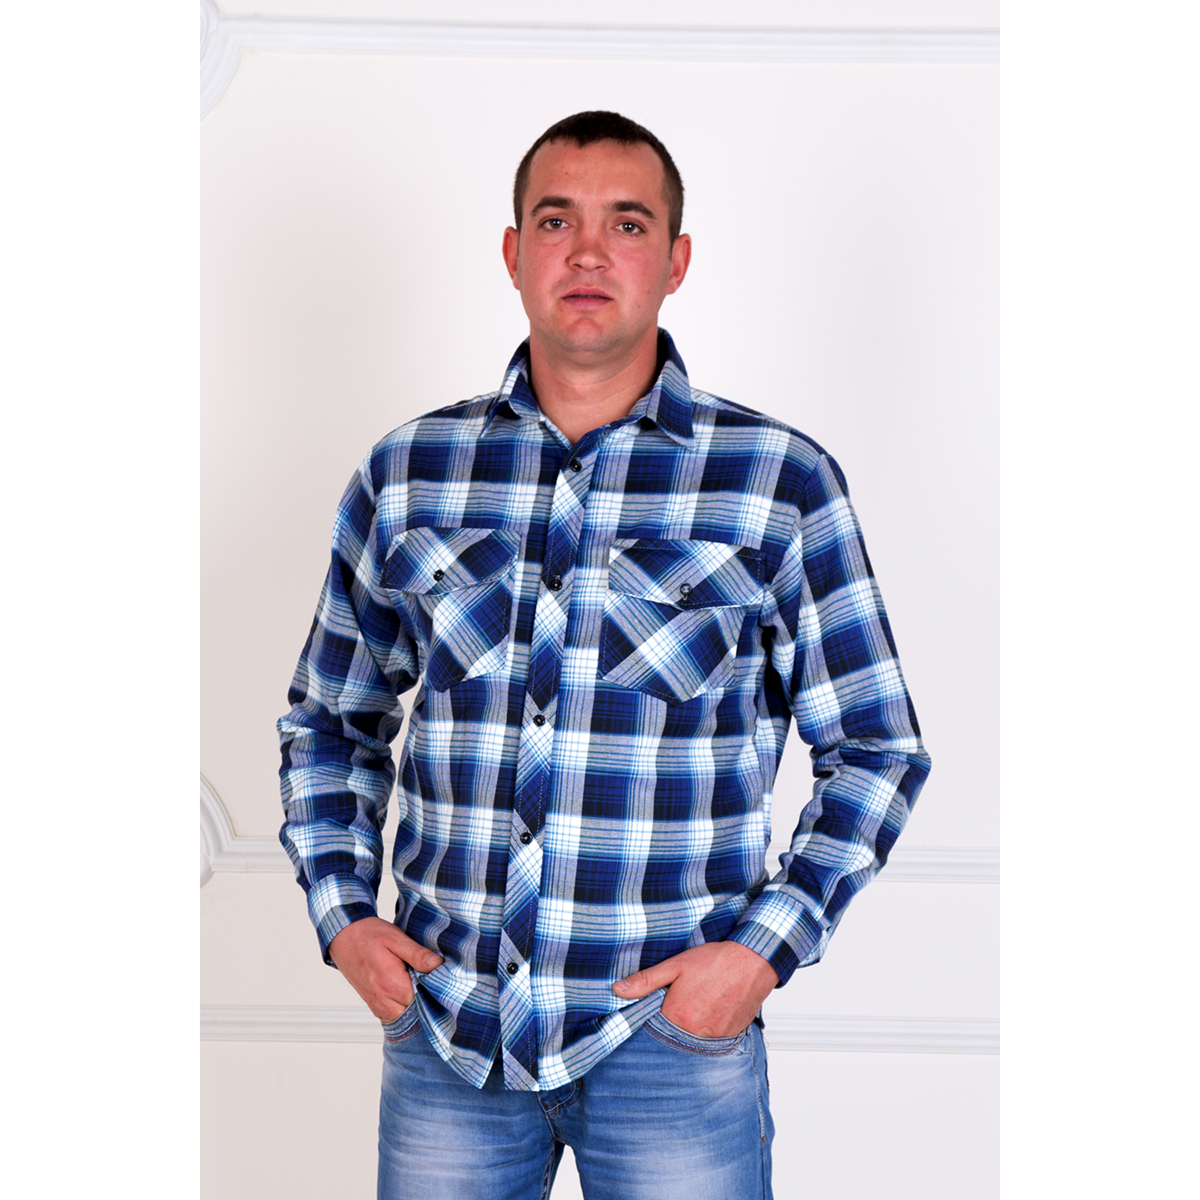 Мужская рубашка Леонард, размер 68Рубашки<br>Обхват груди:136 см<br>Обхват талии:132 см<br>Обхват бедер:136 см<br>Обхват шеи, ворот:50 см<br>Рост:178-188 см<br><br>Тип: Муж. рубашка<br>Размер: 68<br>Материал: Фуле